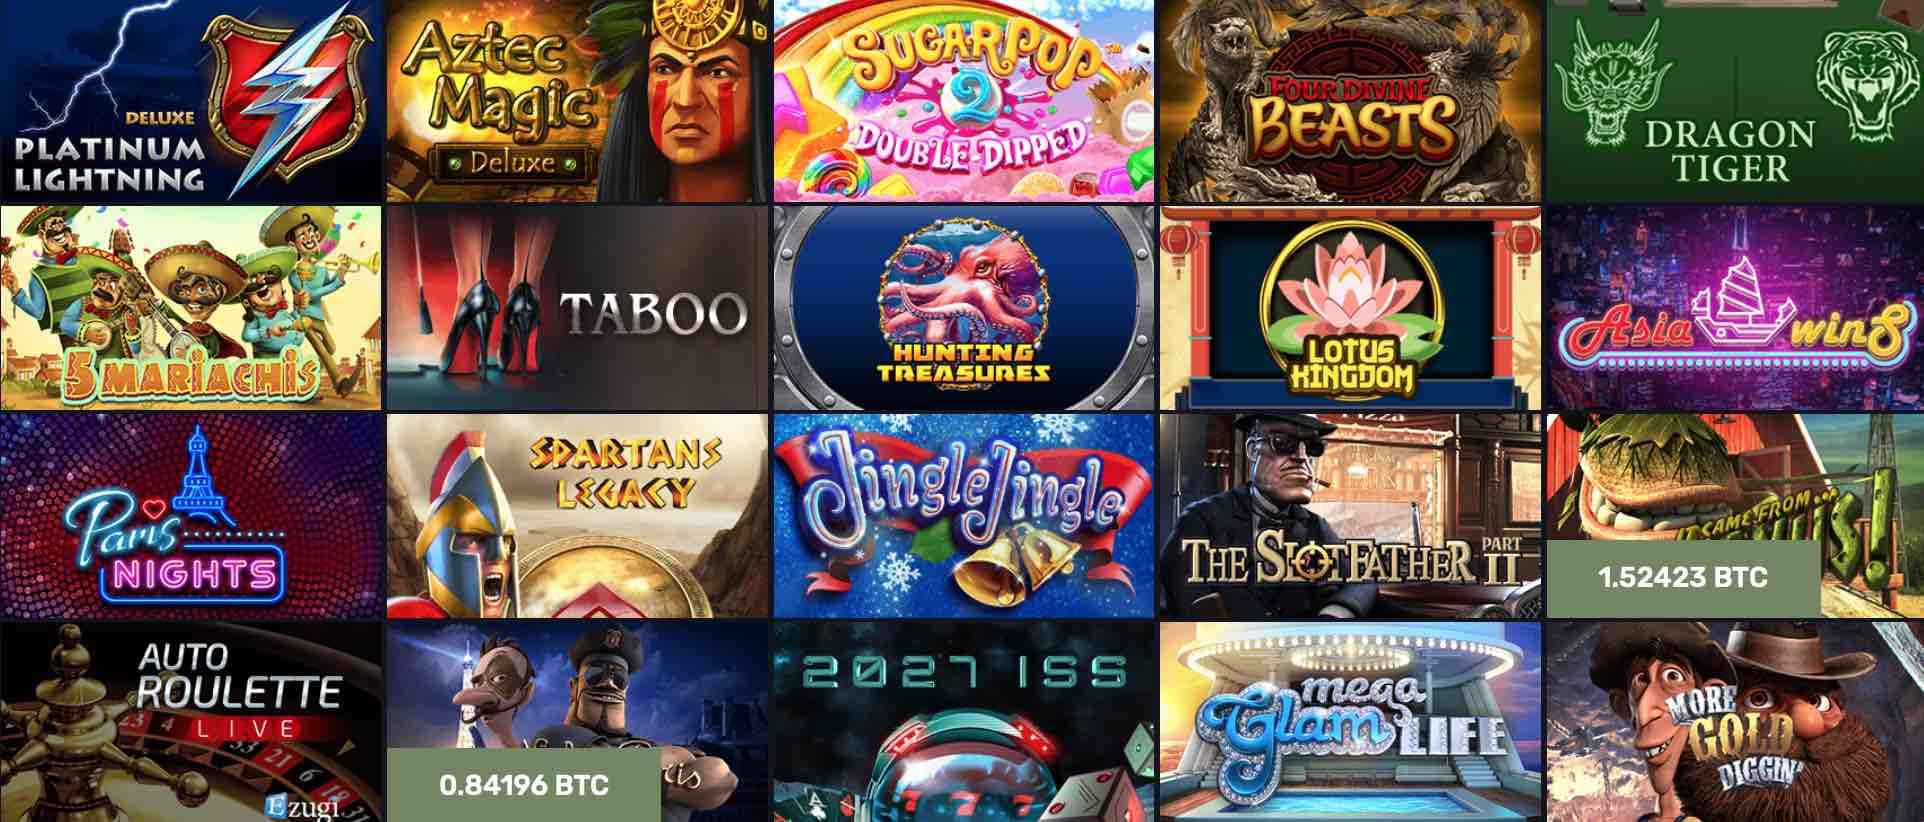 Closest casino to lake worth fl